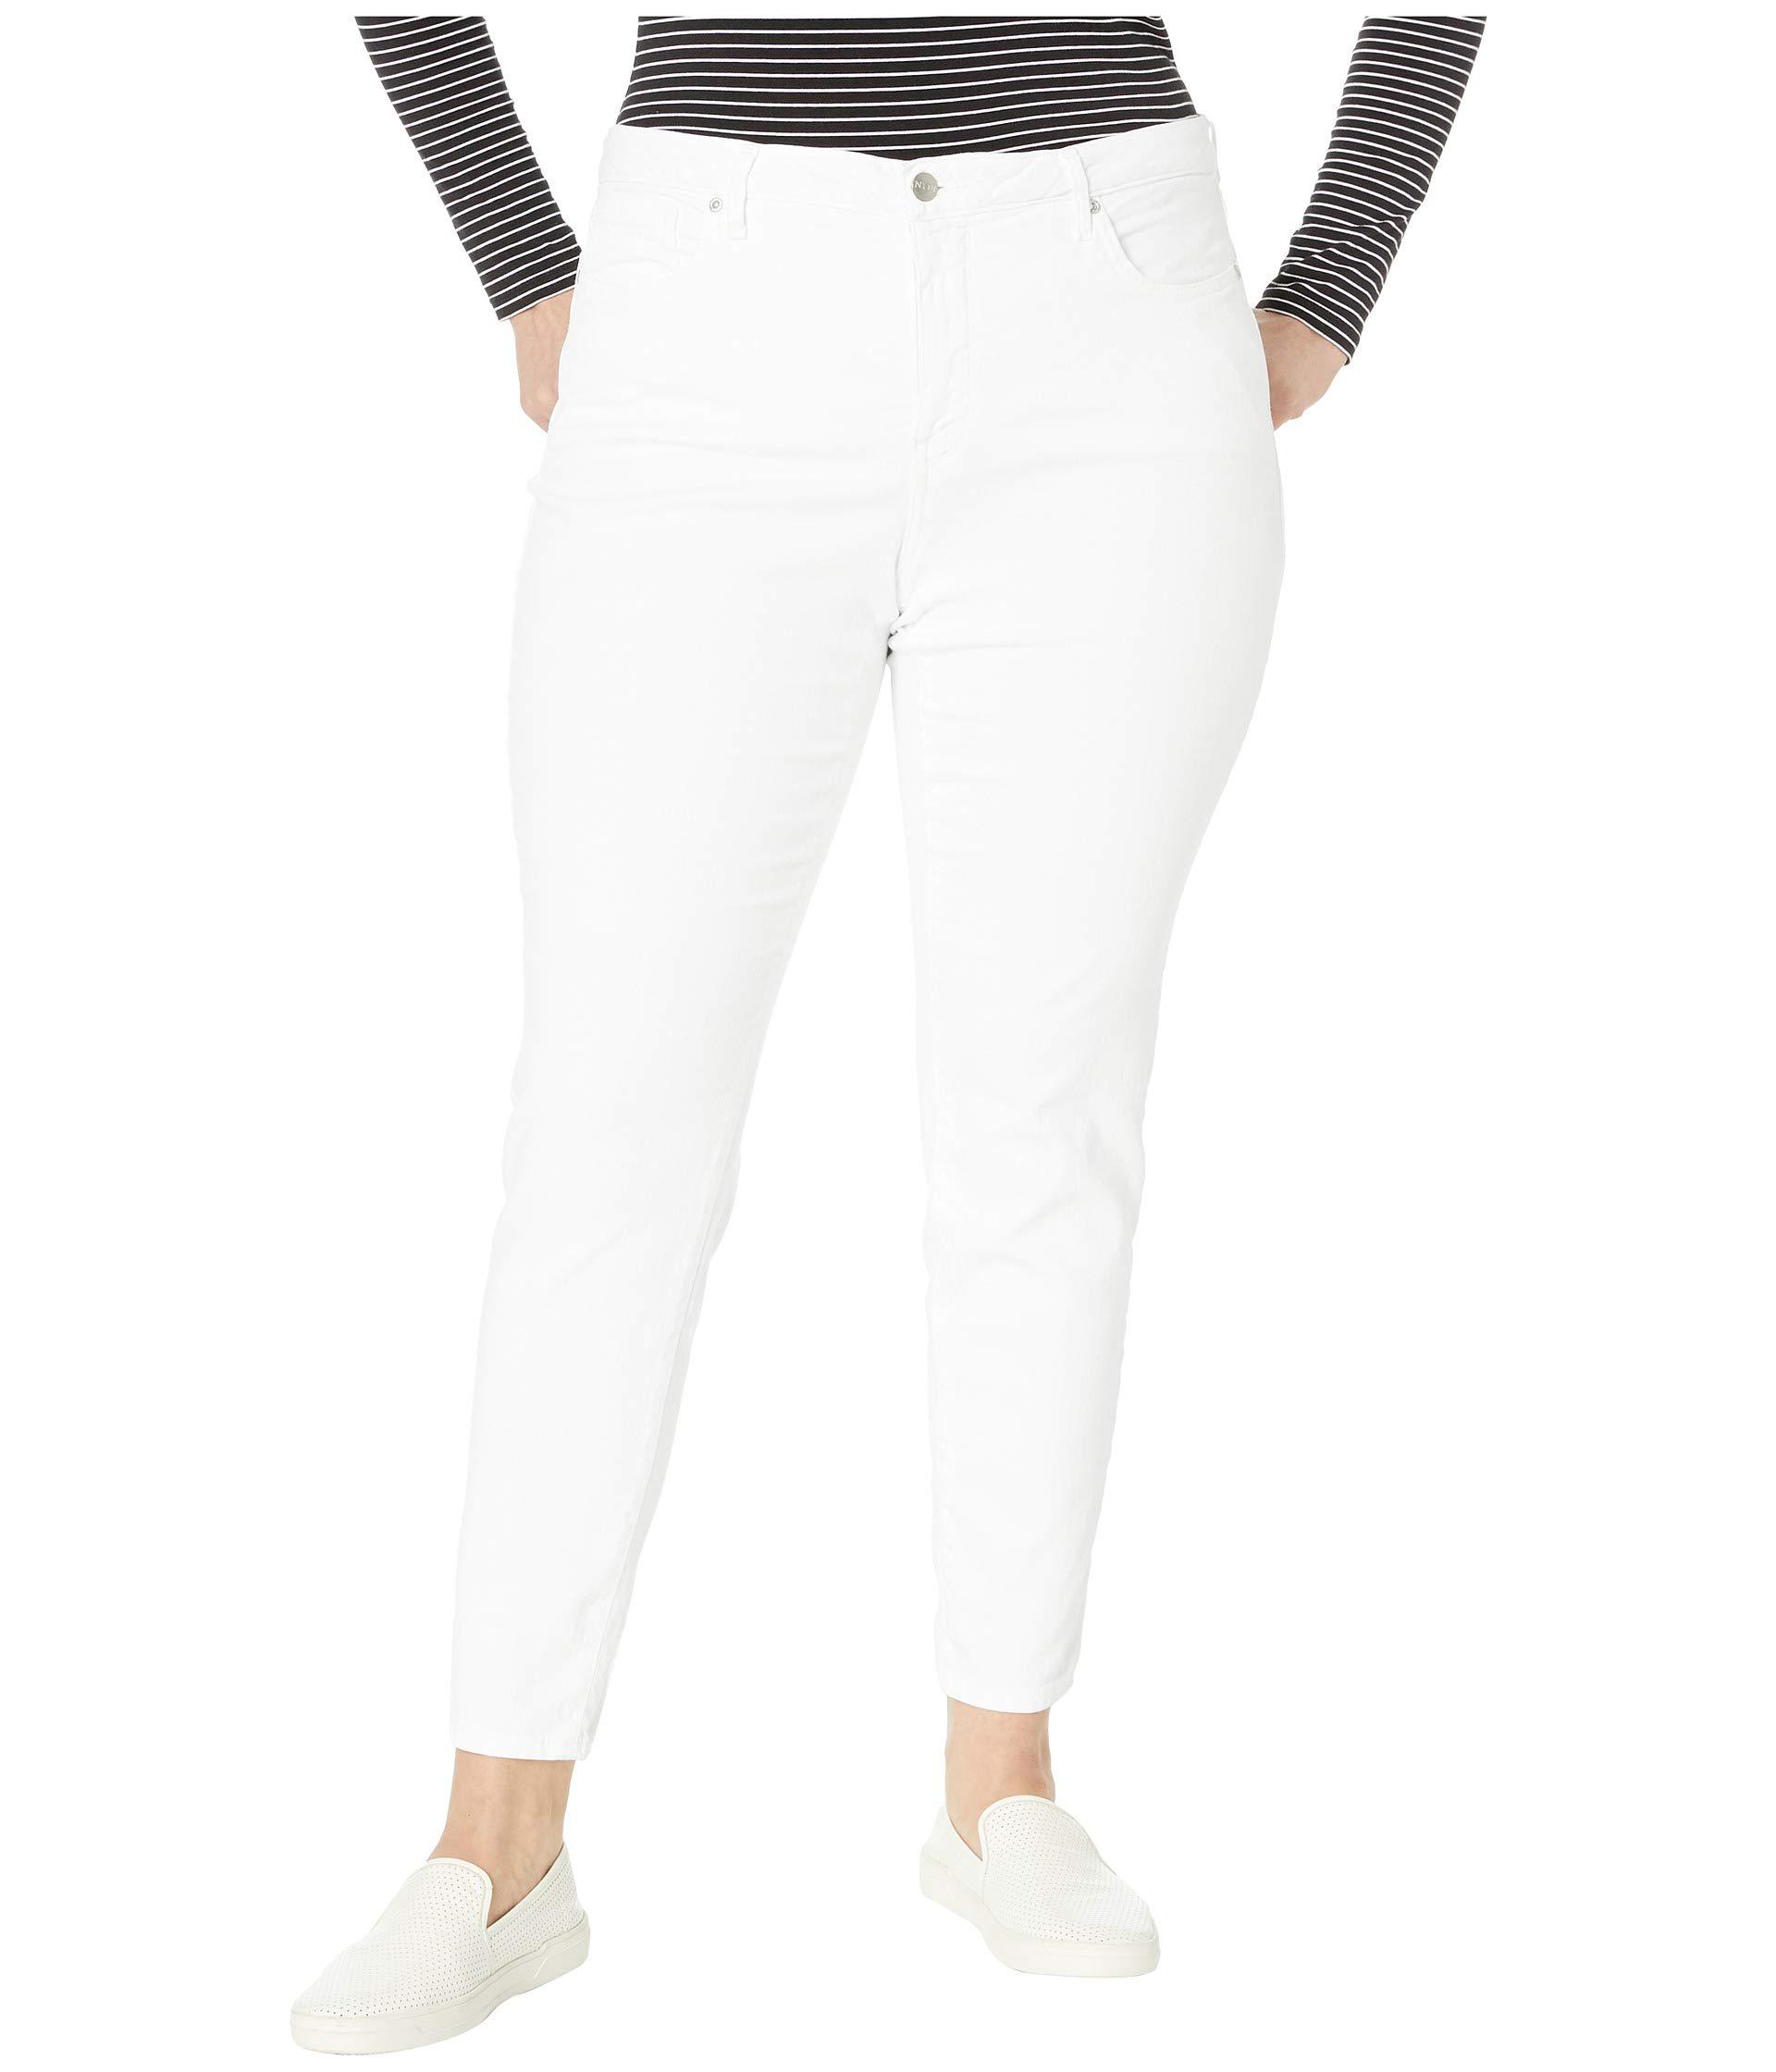 9263fcbb1f96f Lyst - NYDJ Plus Size Ami Skinny In Optic White (optic White ...